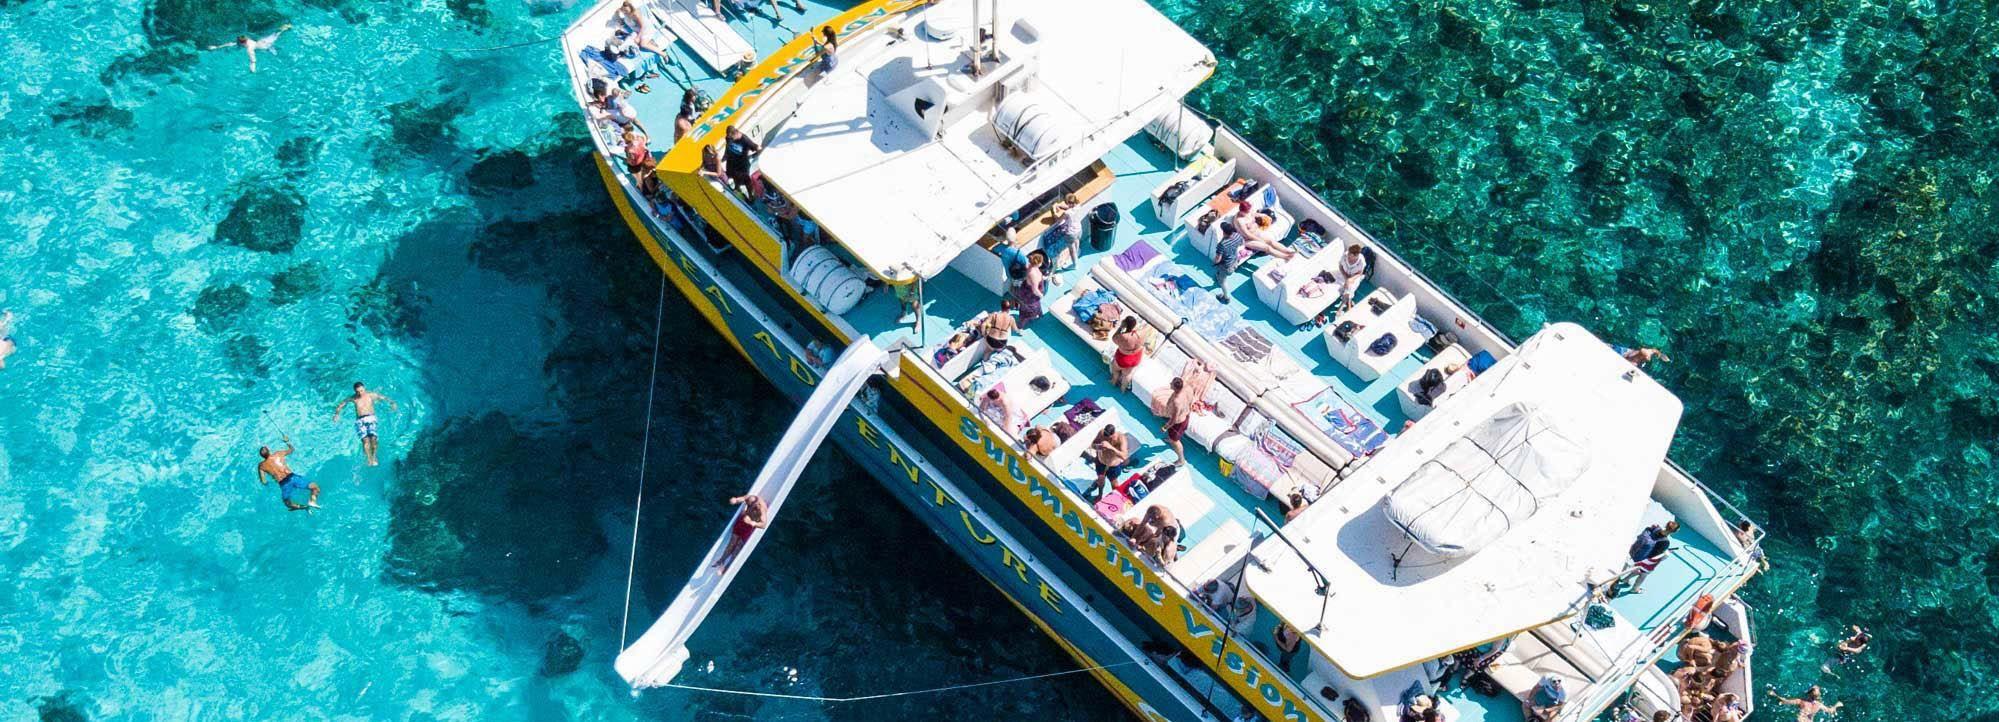 Gozo, Comino, Blaue Lagune & Meereshöhlen: Tagestour